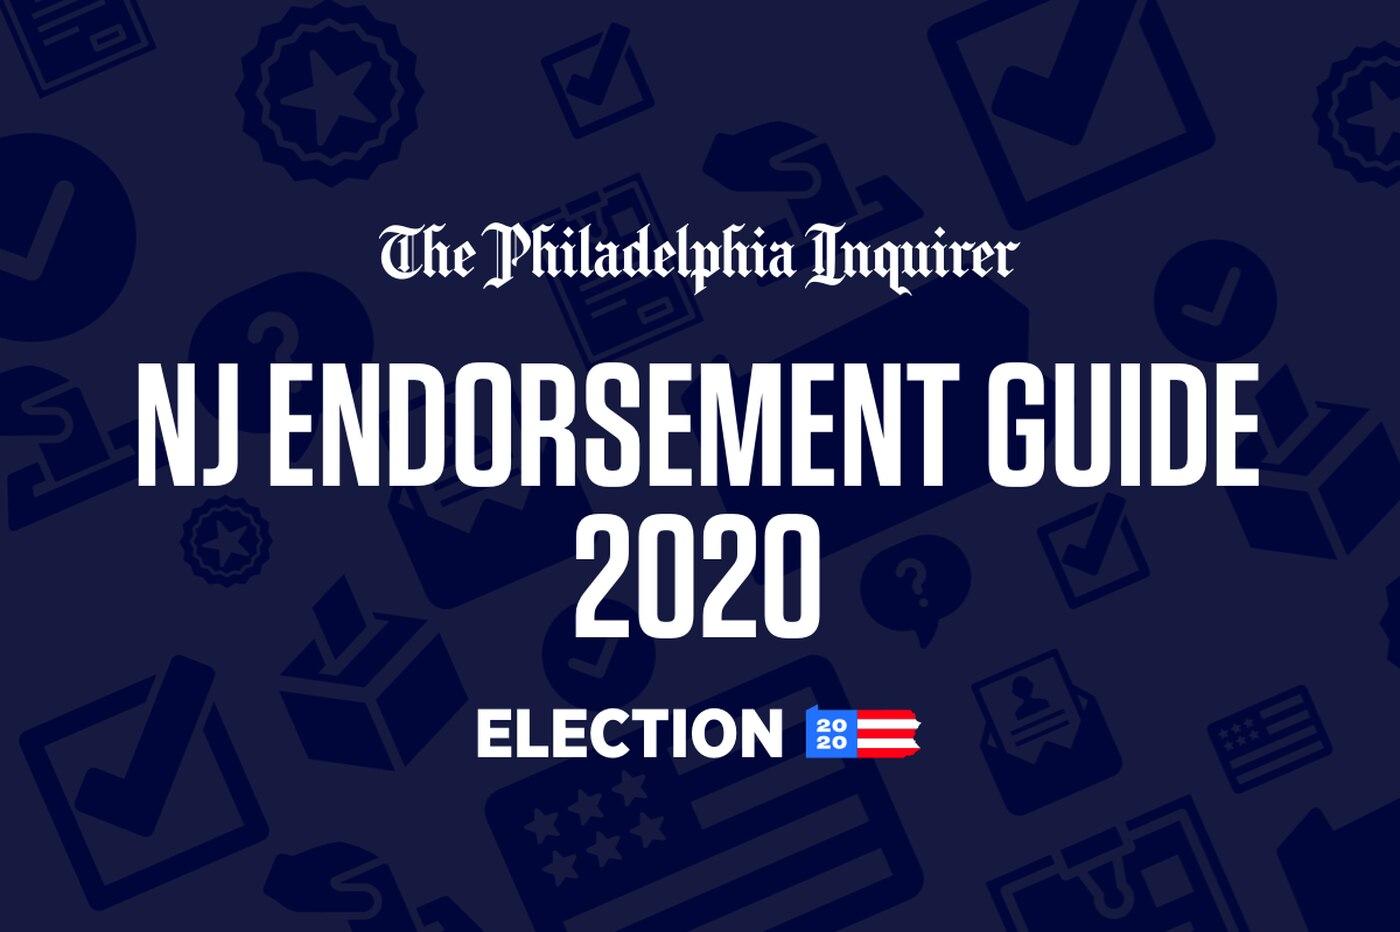 New Jersey 2020 Endorsement Guide | Philadelphia Inquirer Editorial Board